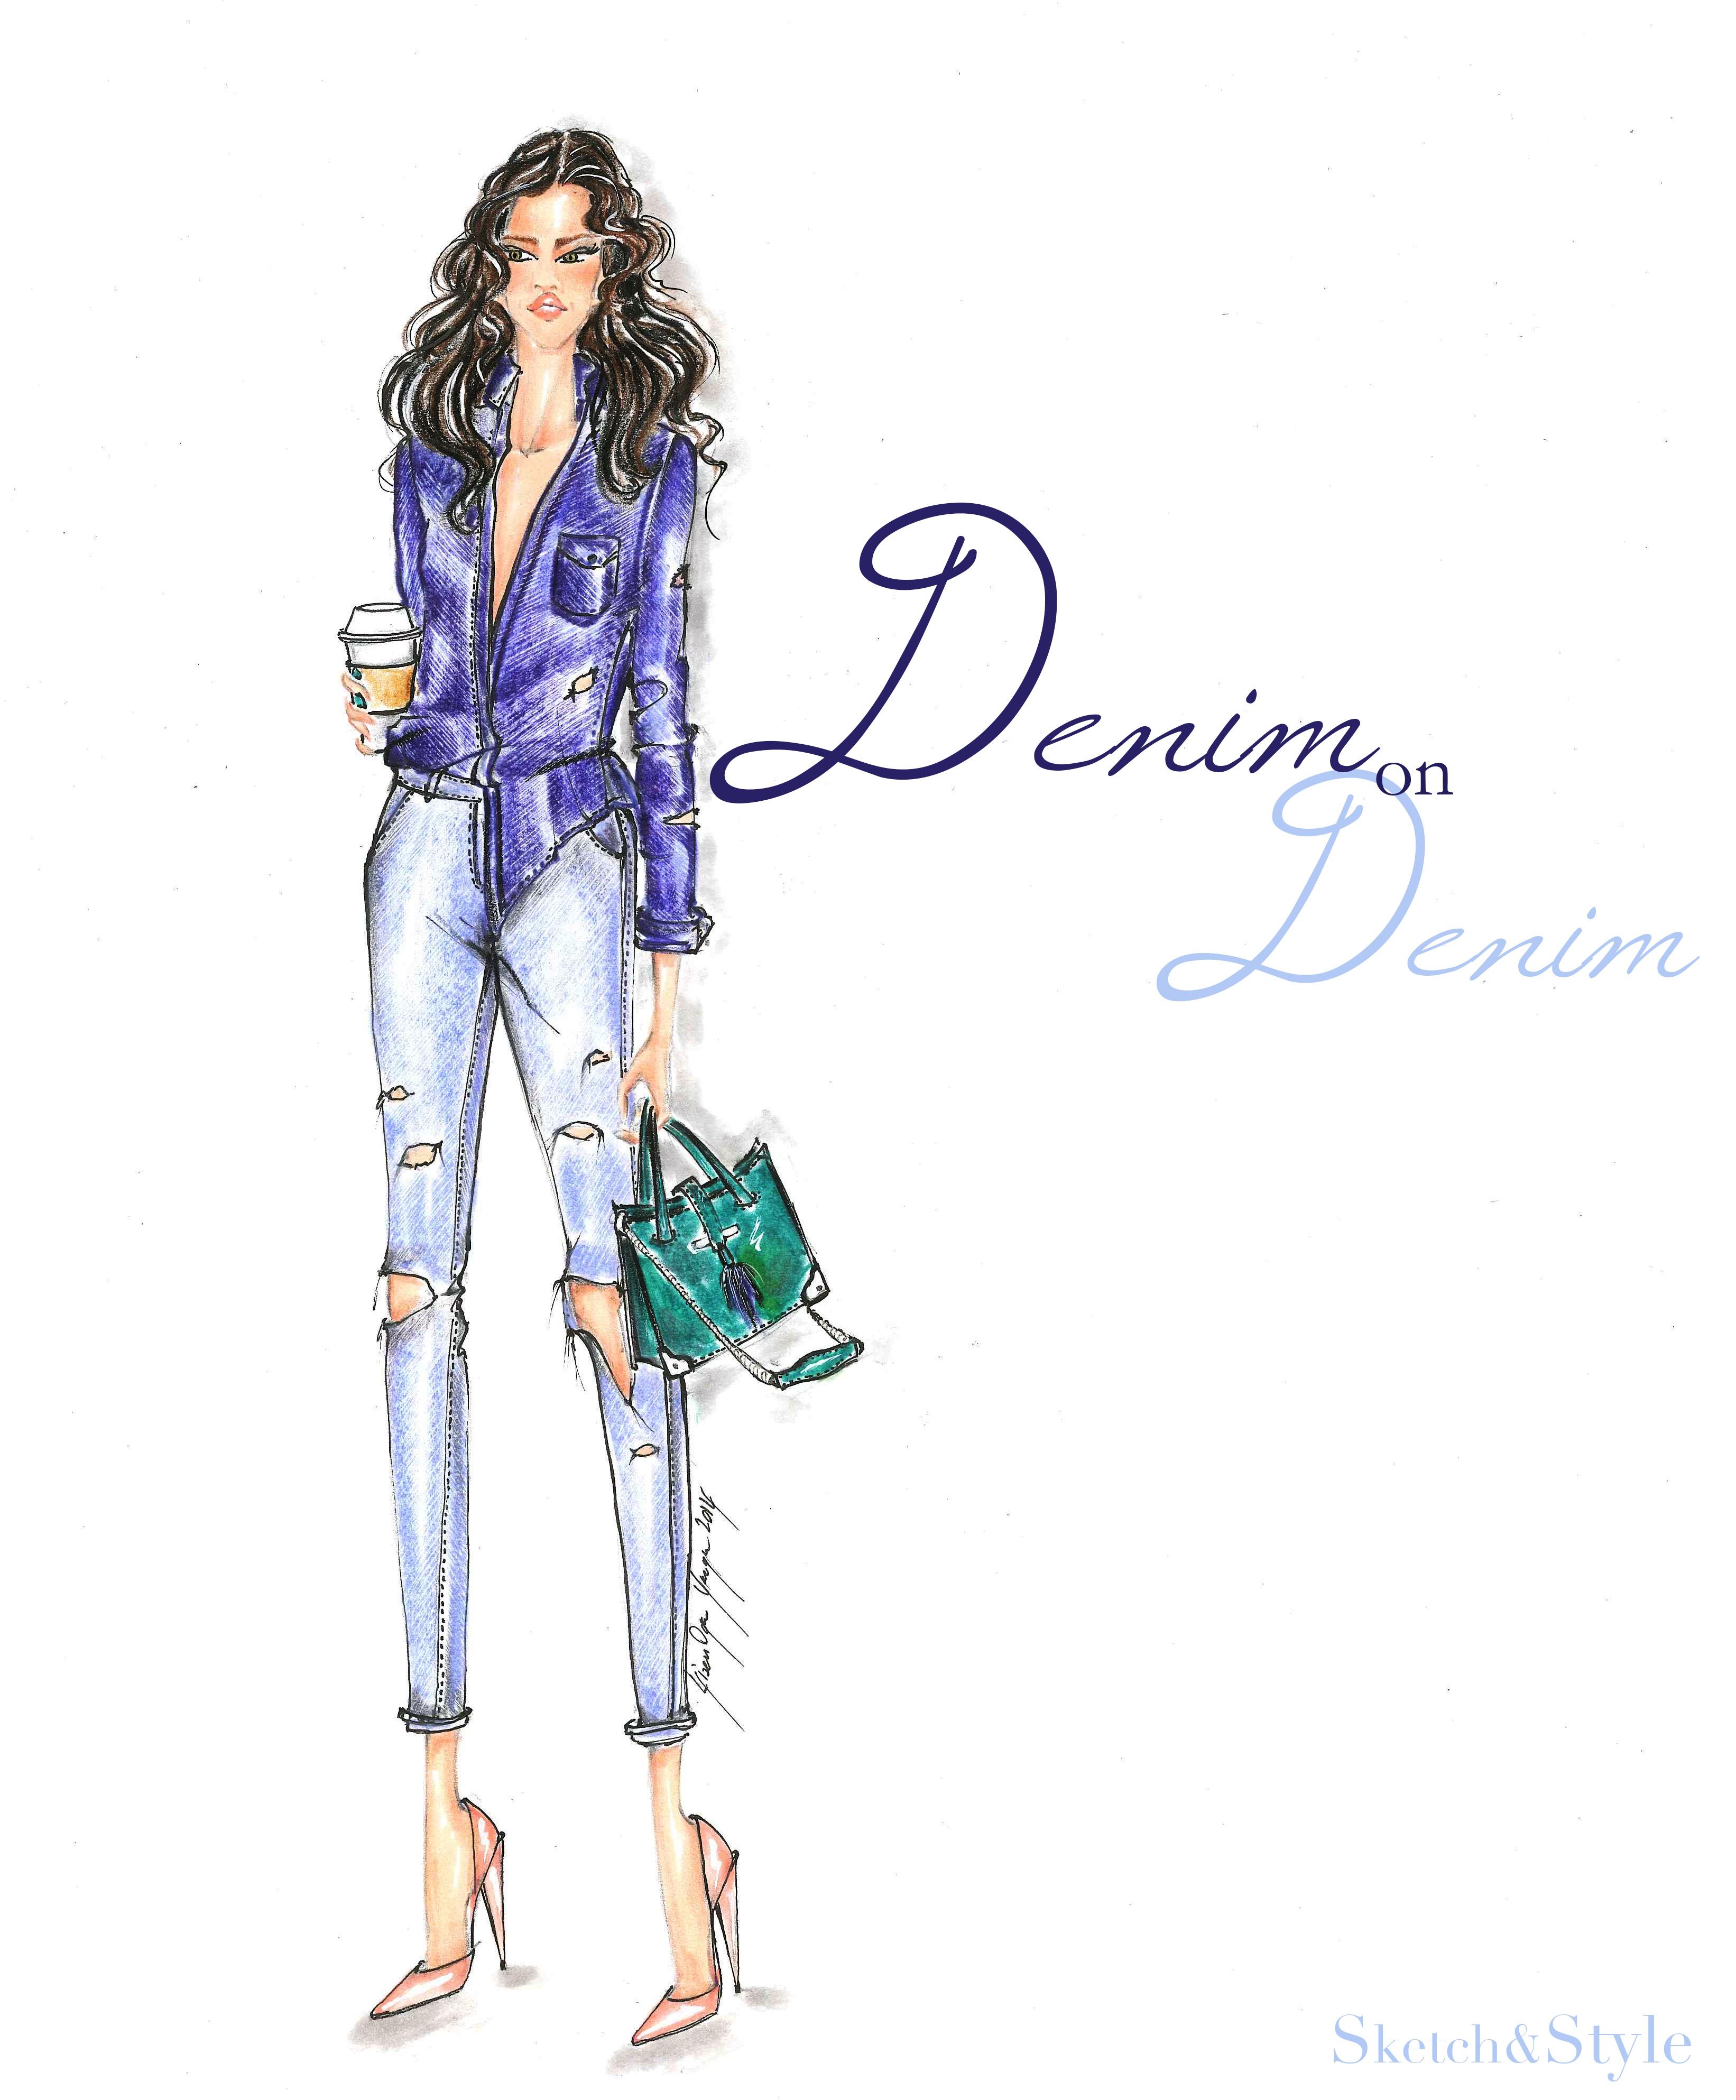 Denim on Denim| Sketch&Style